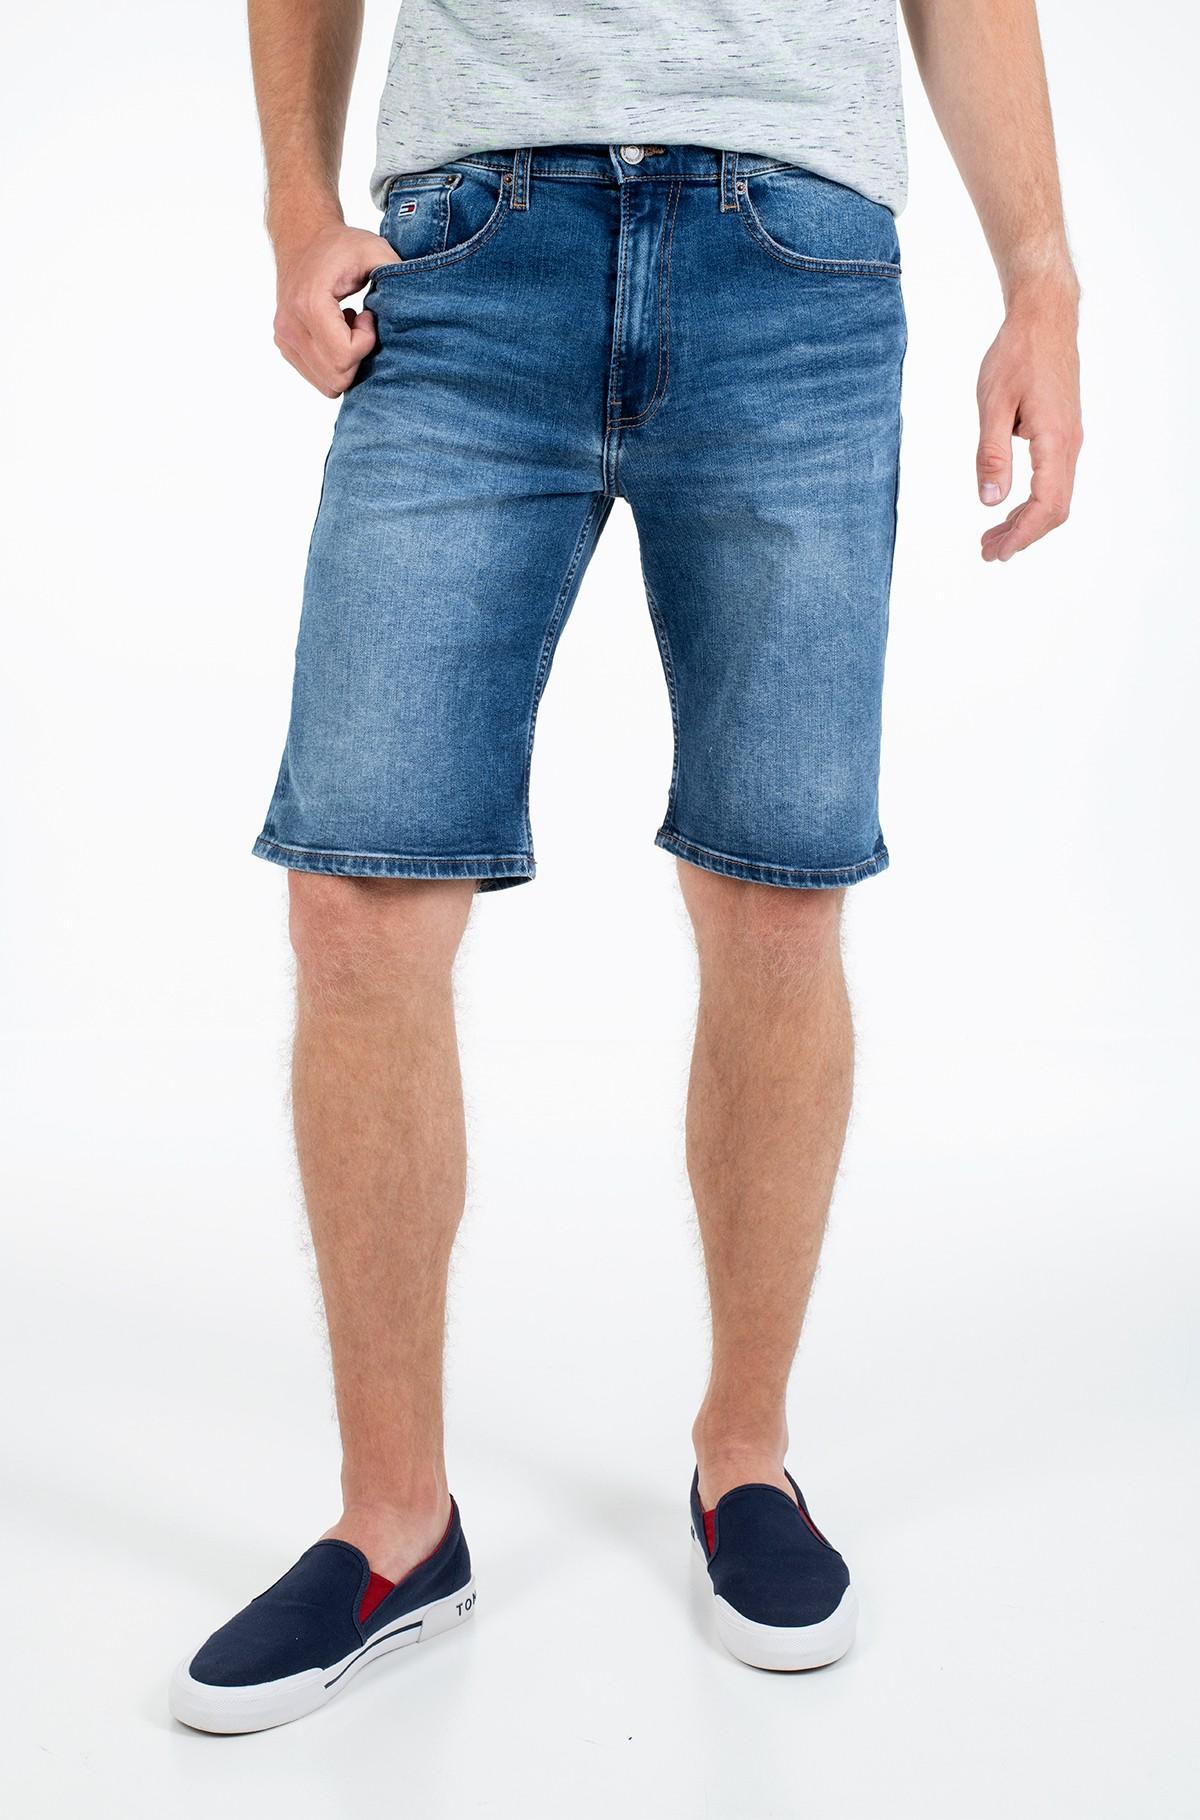 Lühikesed püksid REY RELAXED SHORT NCKM-full-1